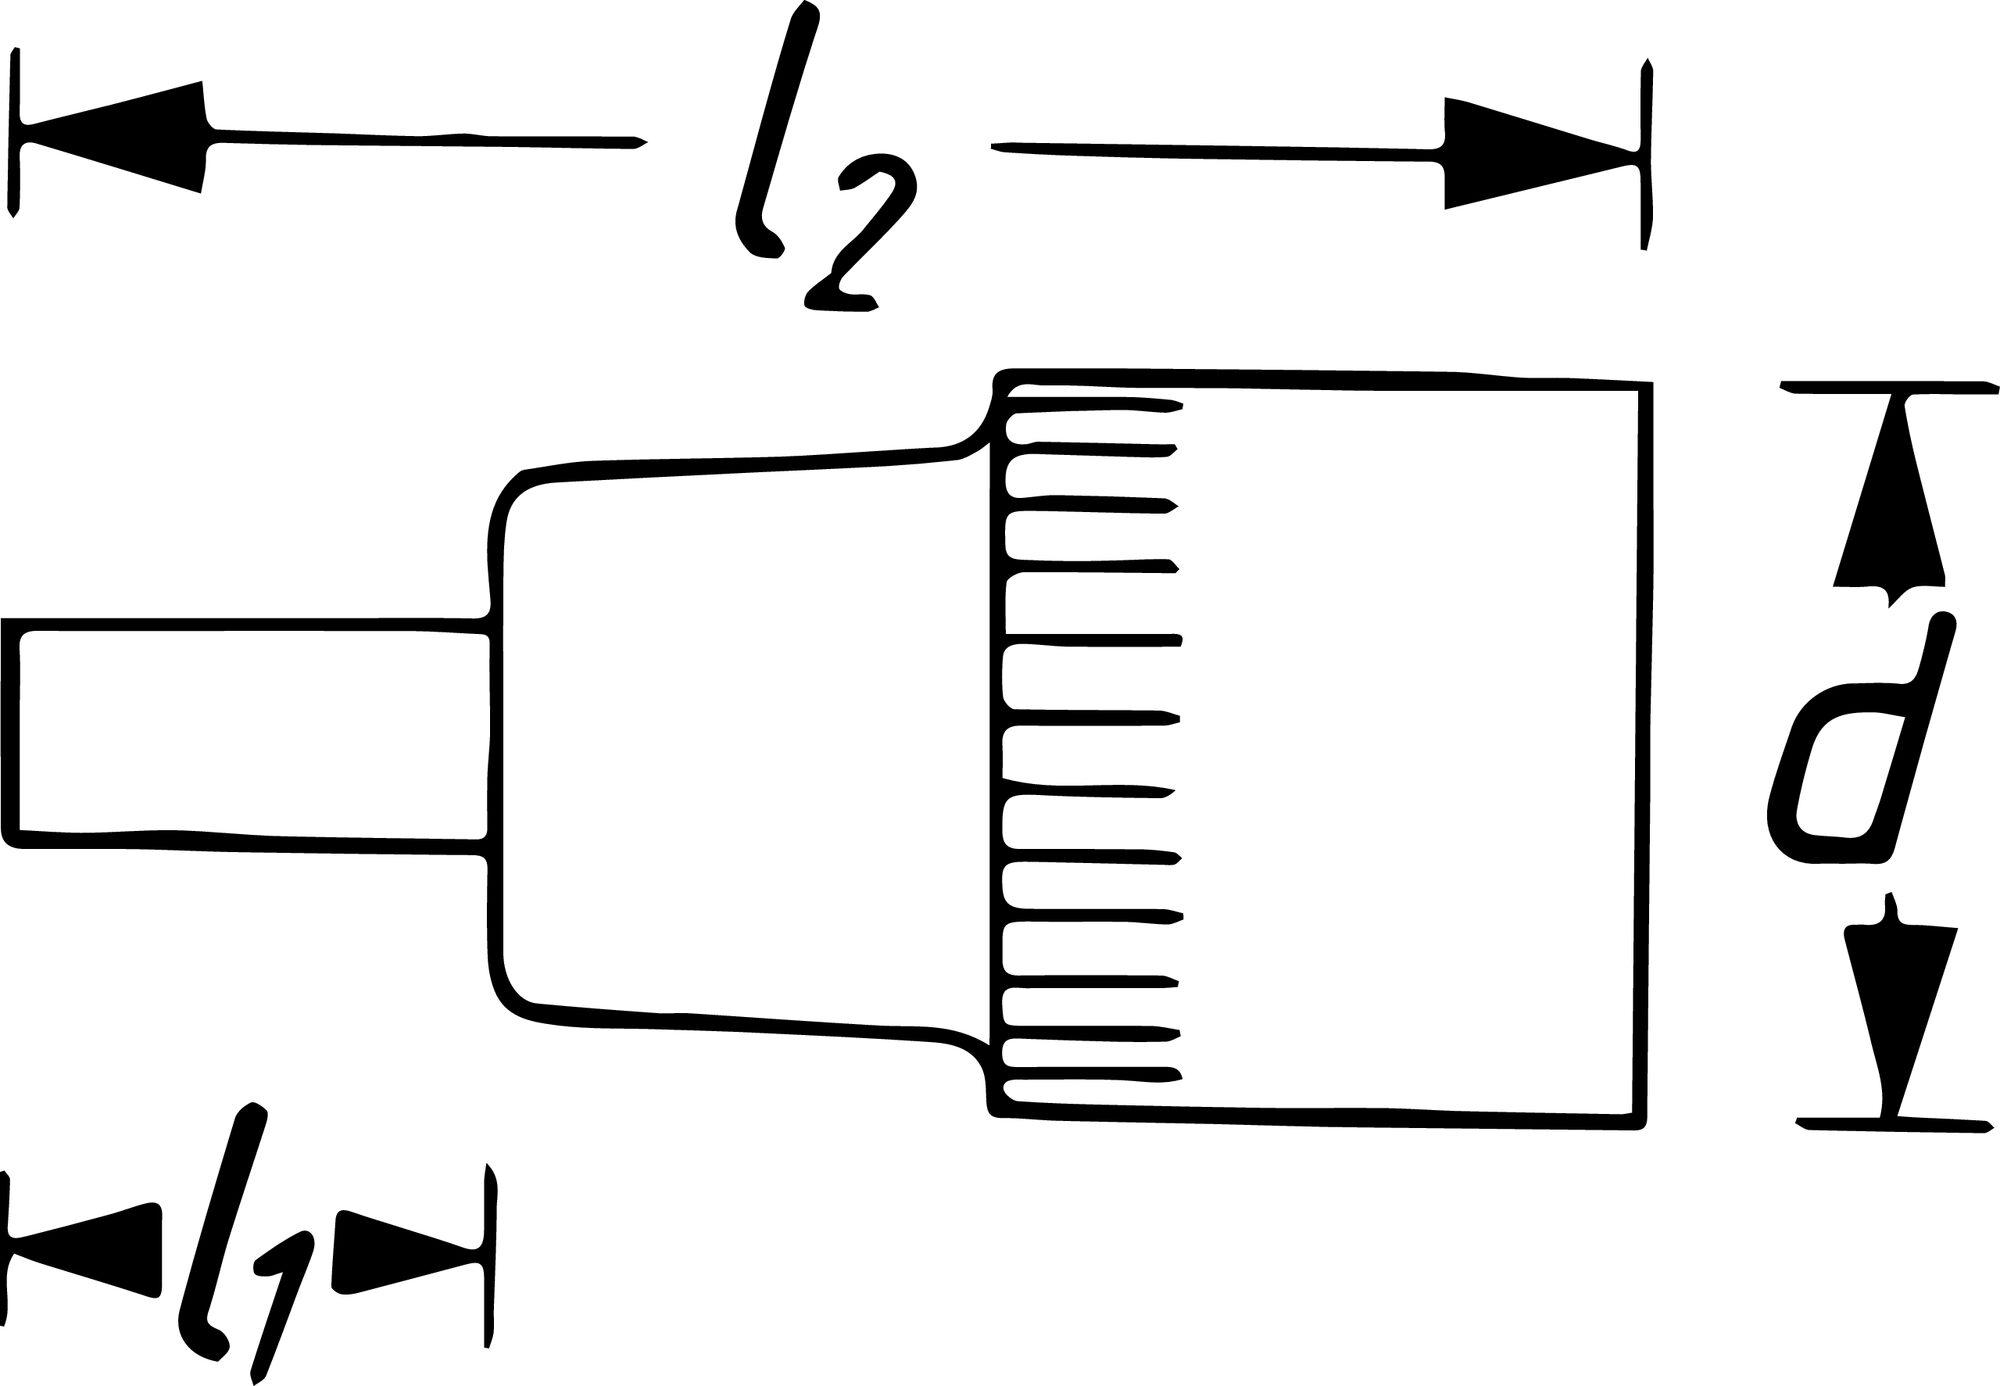 HAZET Zylinderkopf Schraubendreher-Steckschlüsseleinsatz 2751 ∙ Vierkant hohl 12,5 mm (1/2 Zoll) ∙ M10